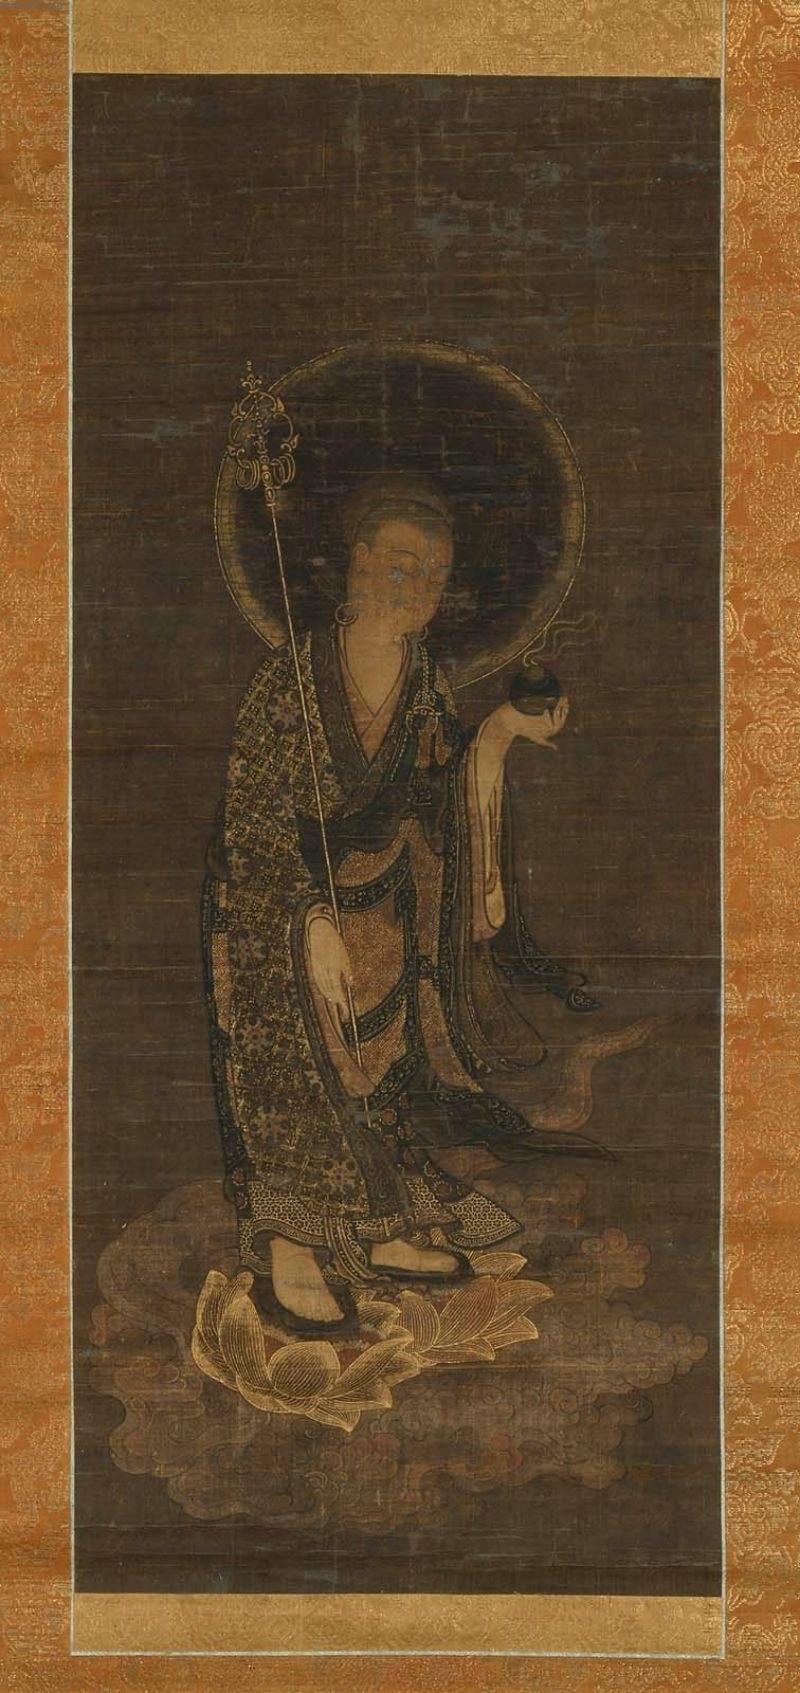 Jizo, the Bodhisattva of the Earth Matrix